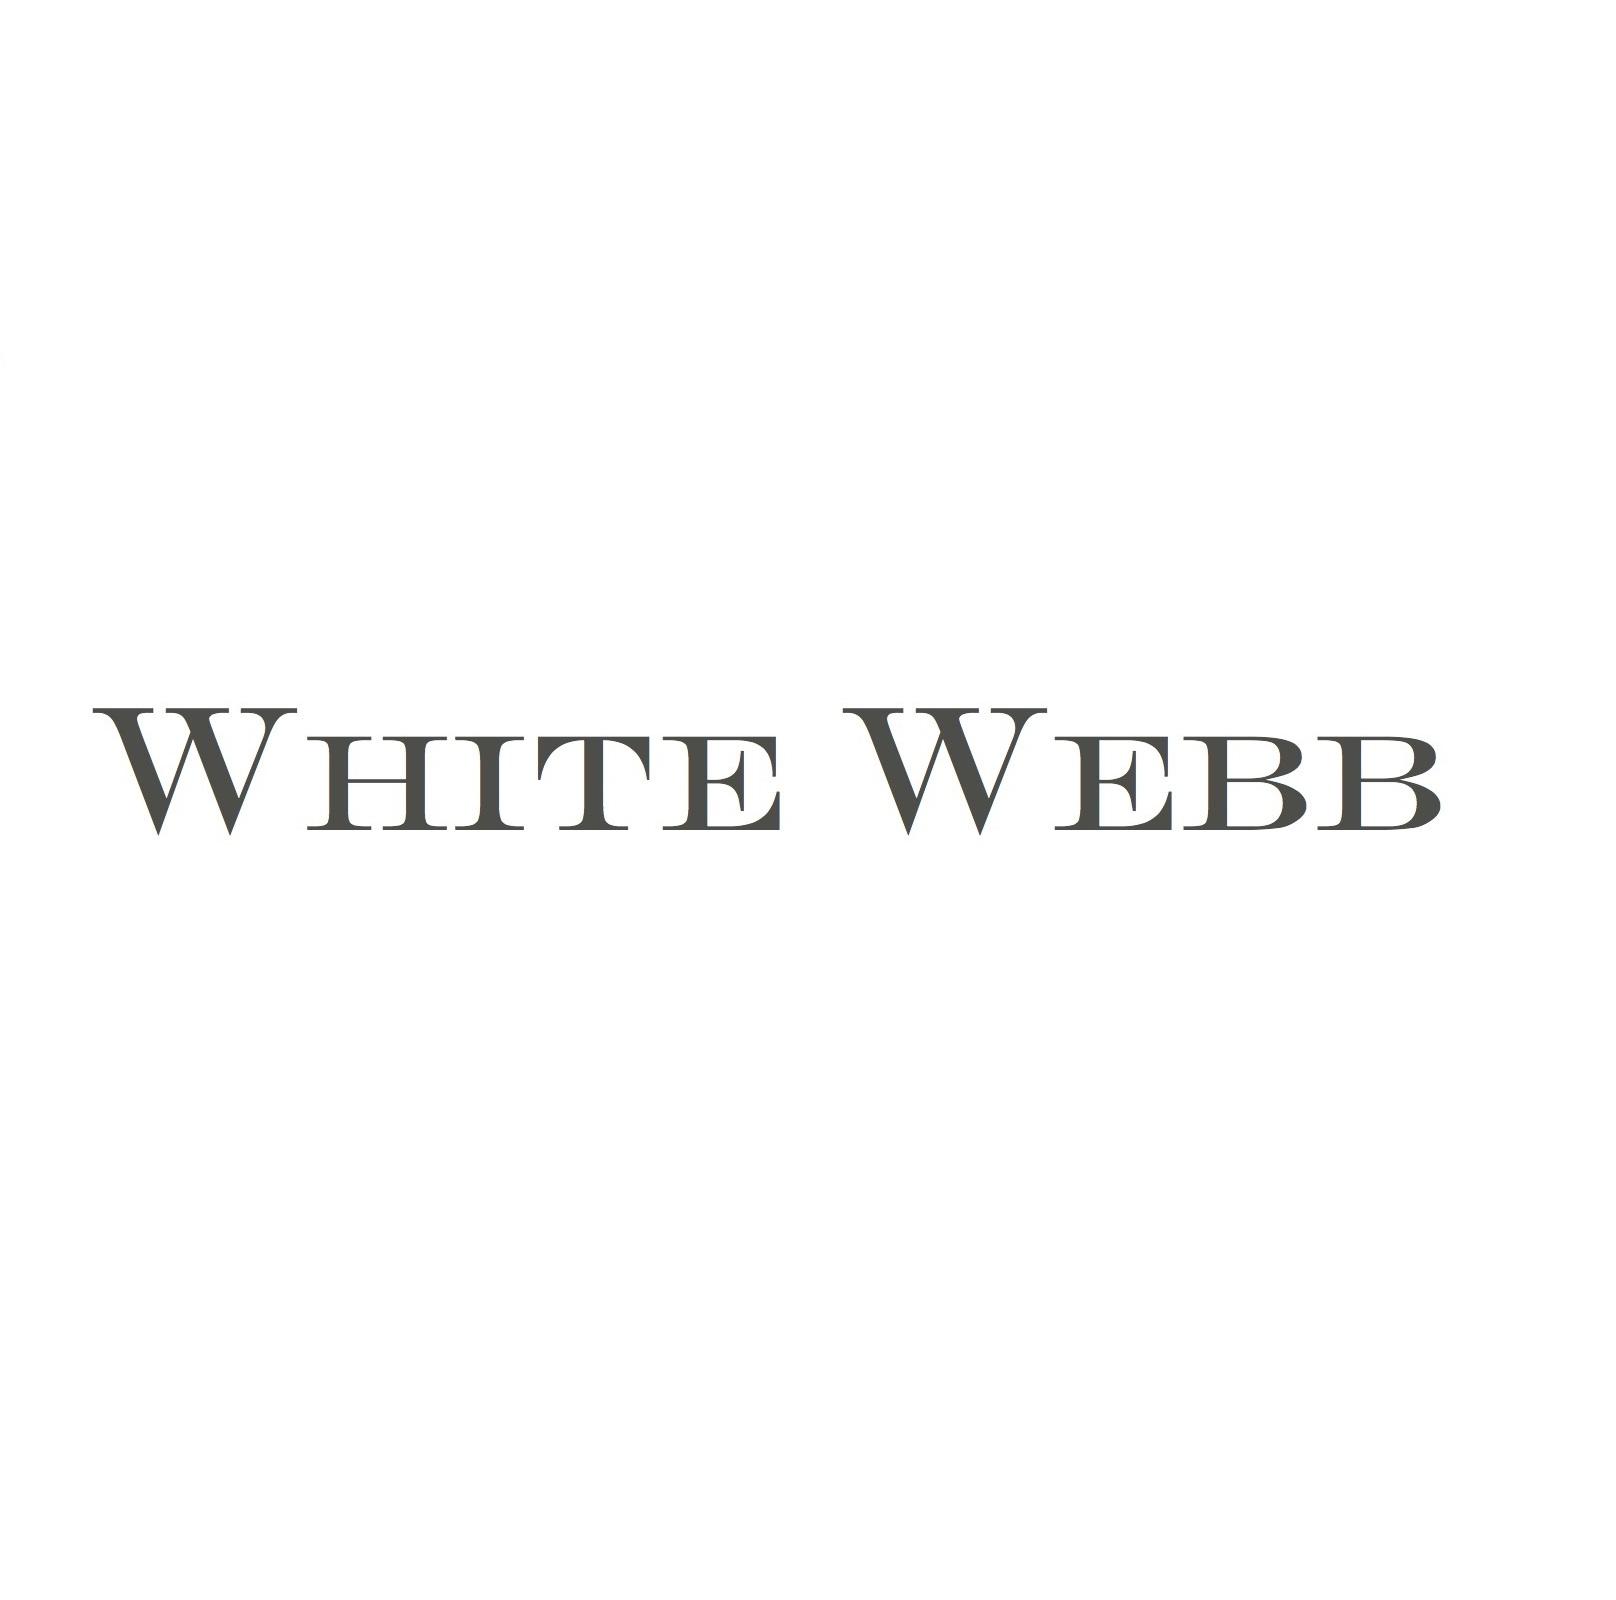 WHITE WEBB INTERIOR DESIGN